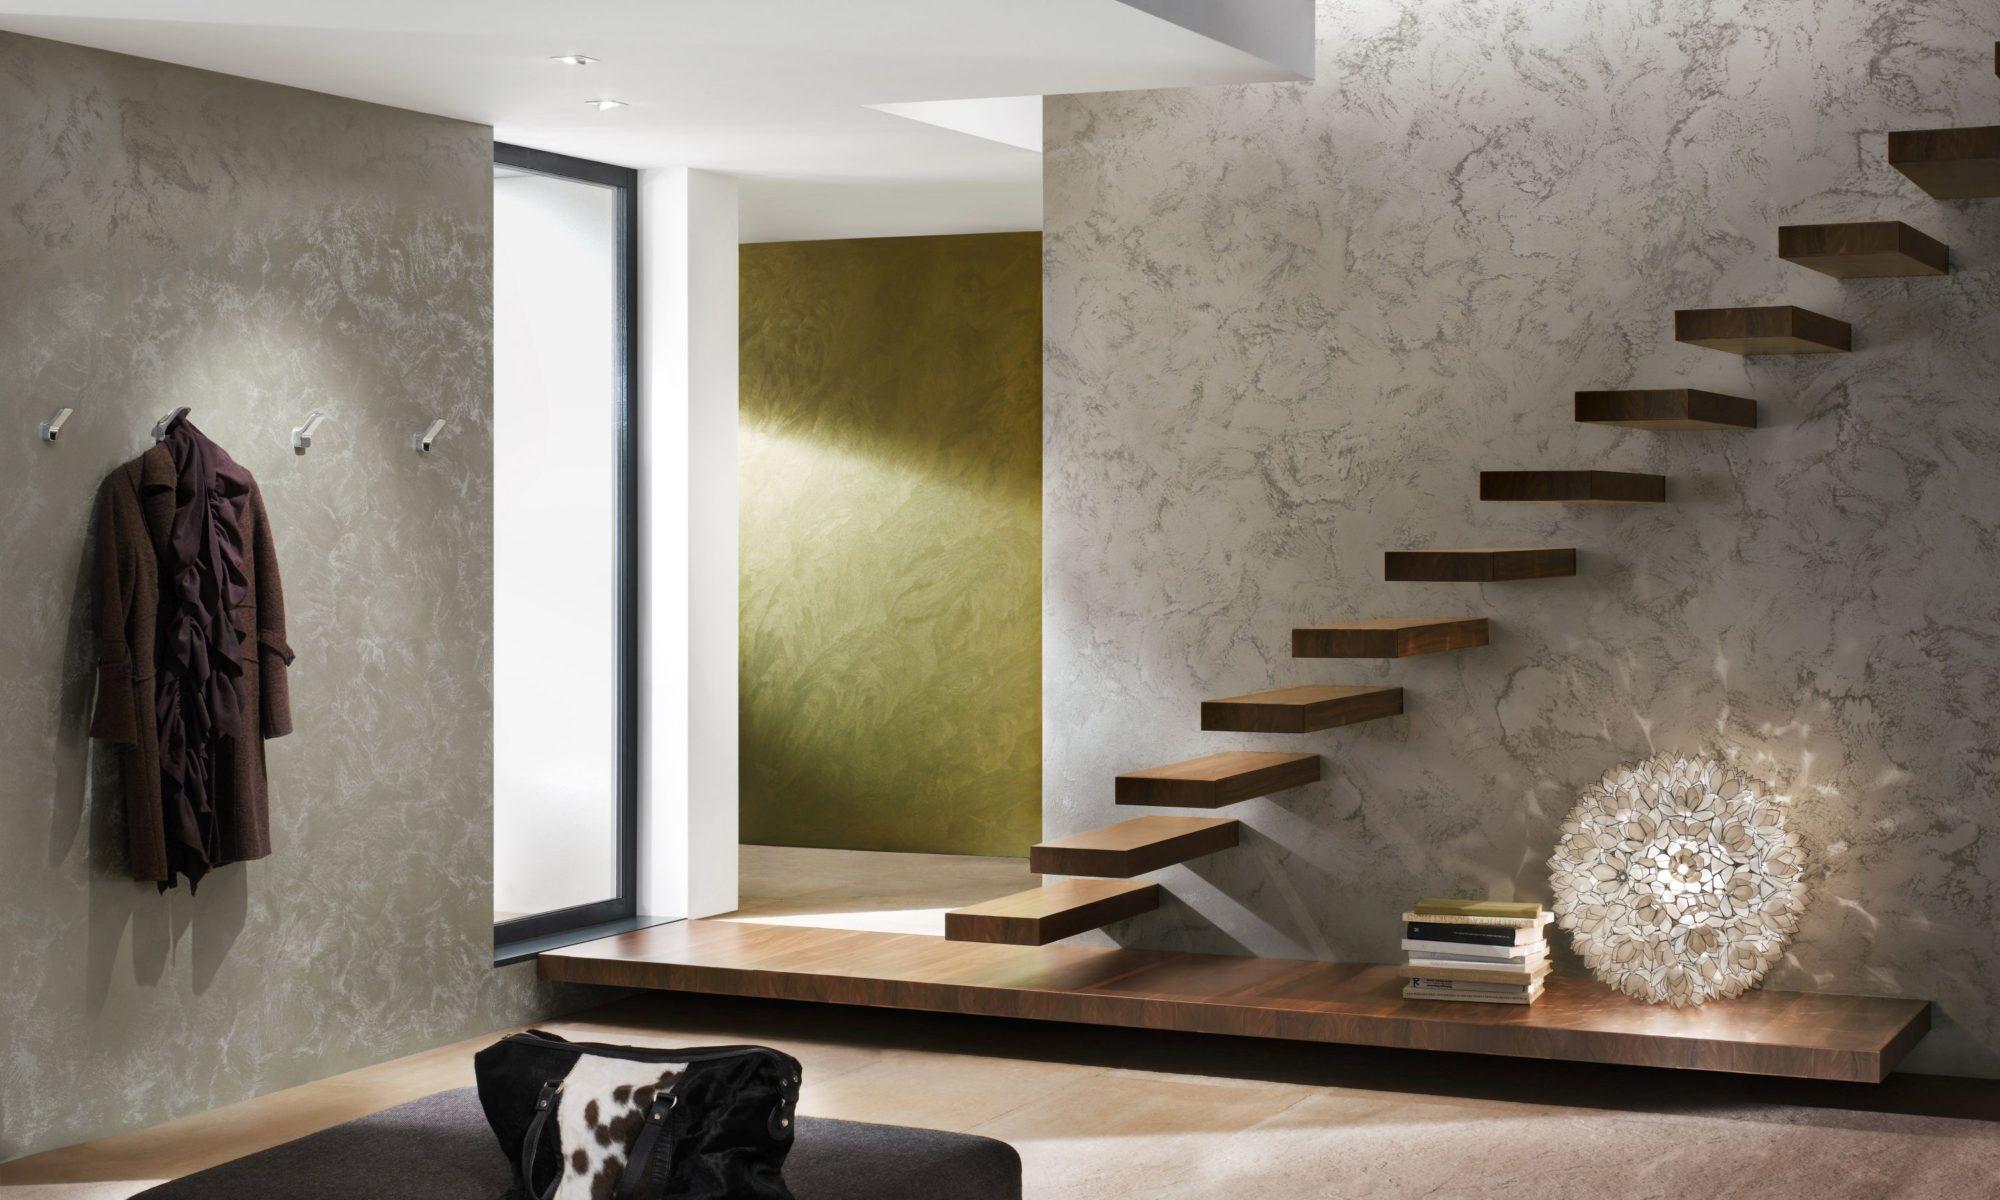 home maler und lackierermeister watermann. Black Bedroom Furniture Sets. Home Design Ideas